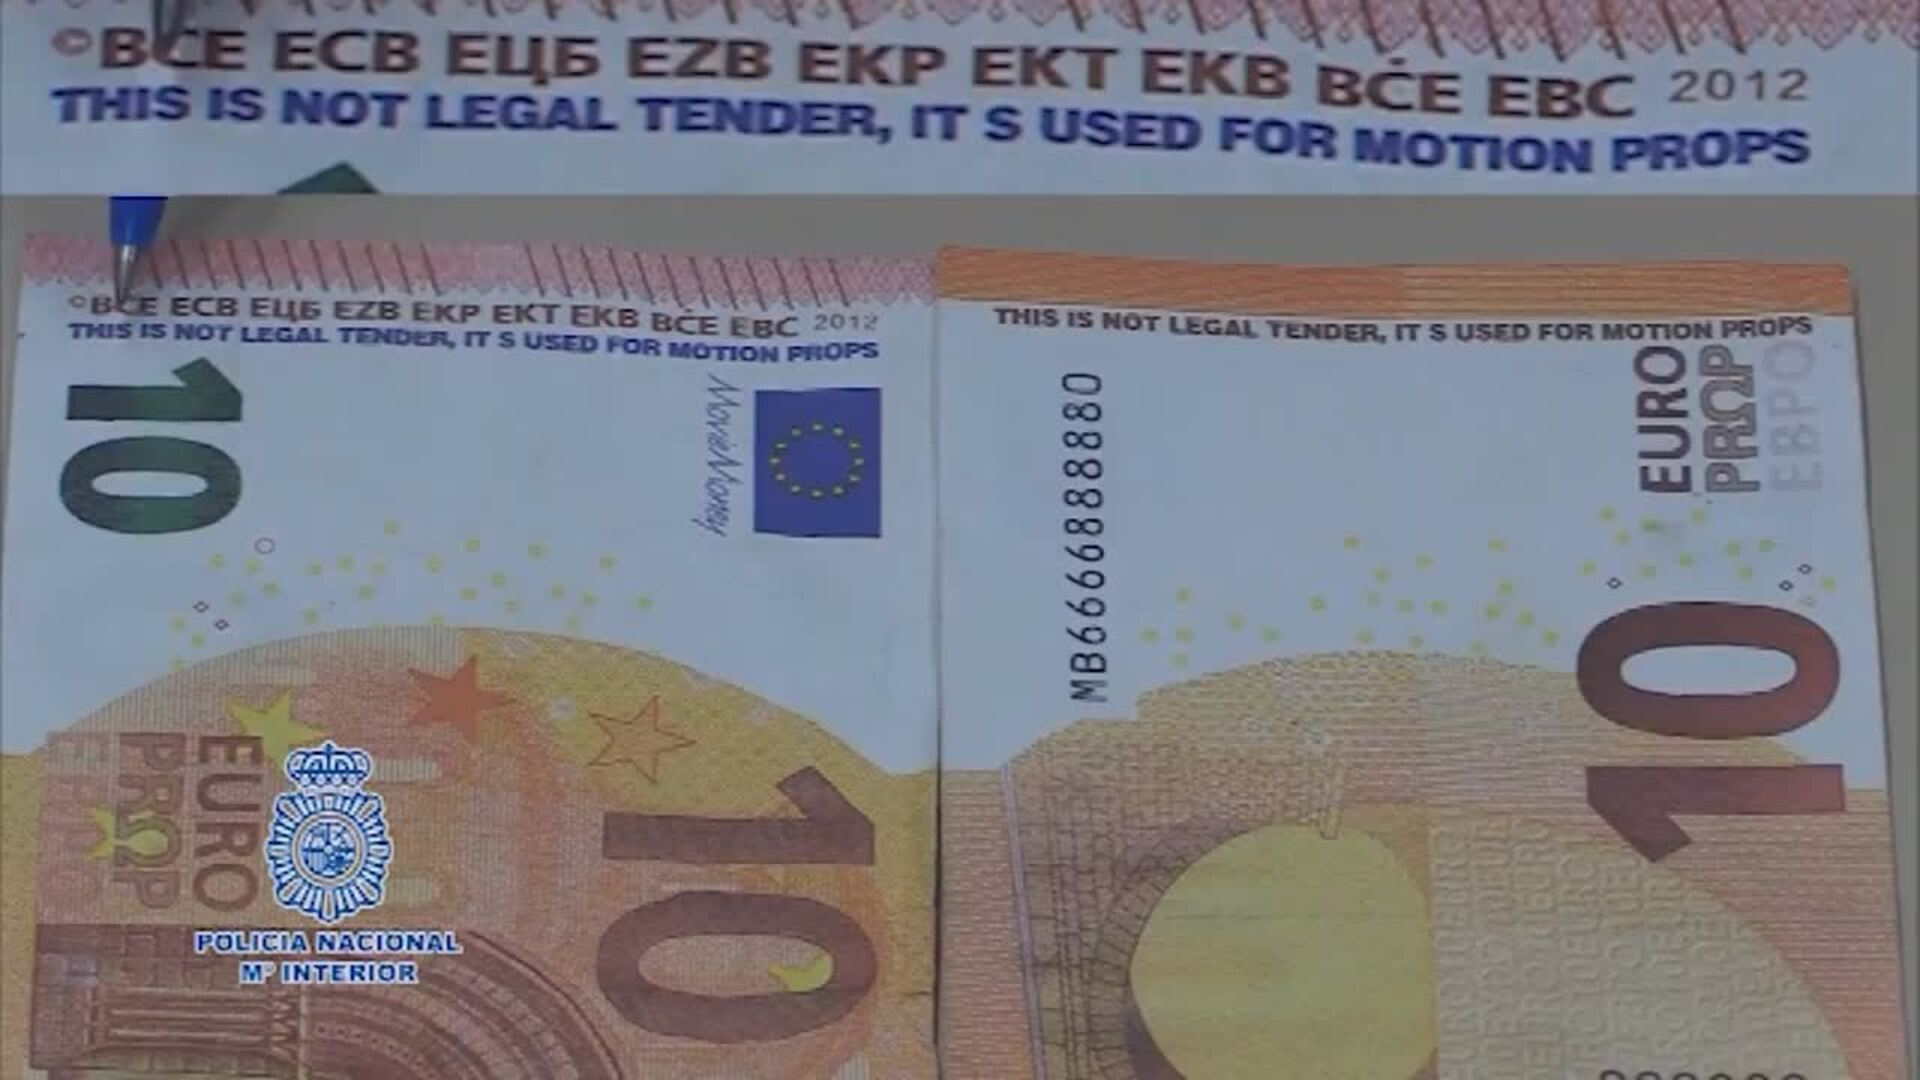 Cómo detectar billetes falsos de 10 euros